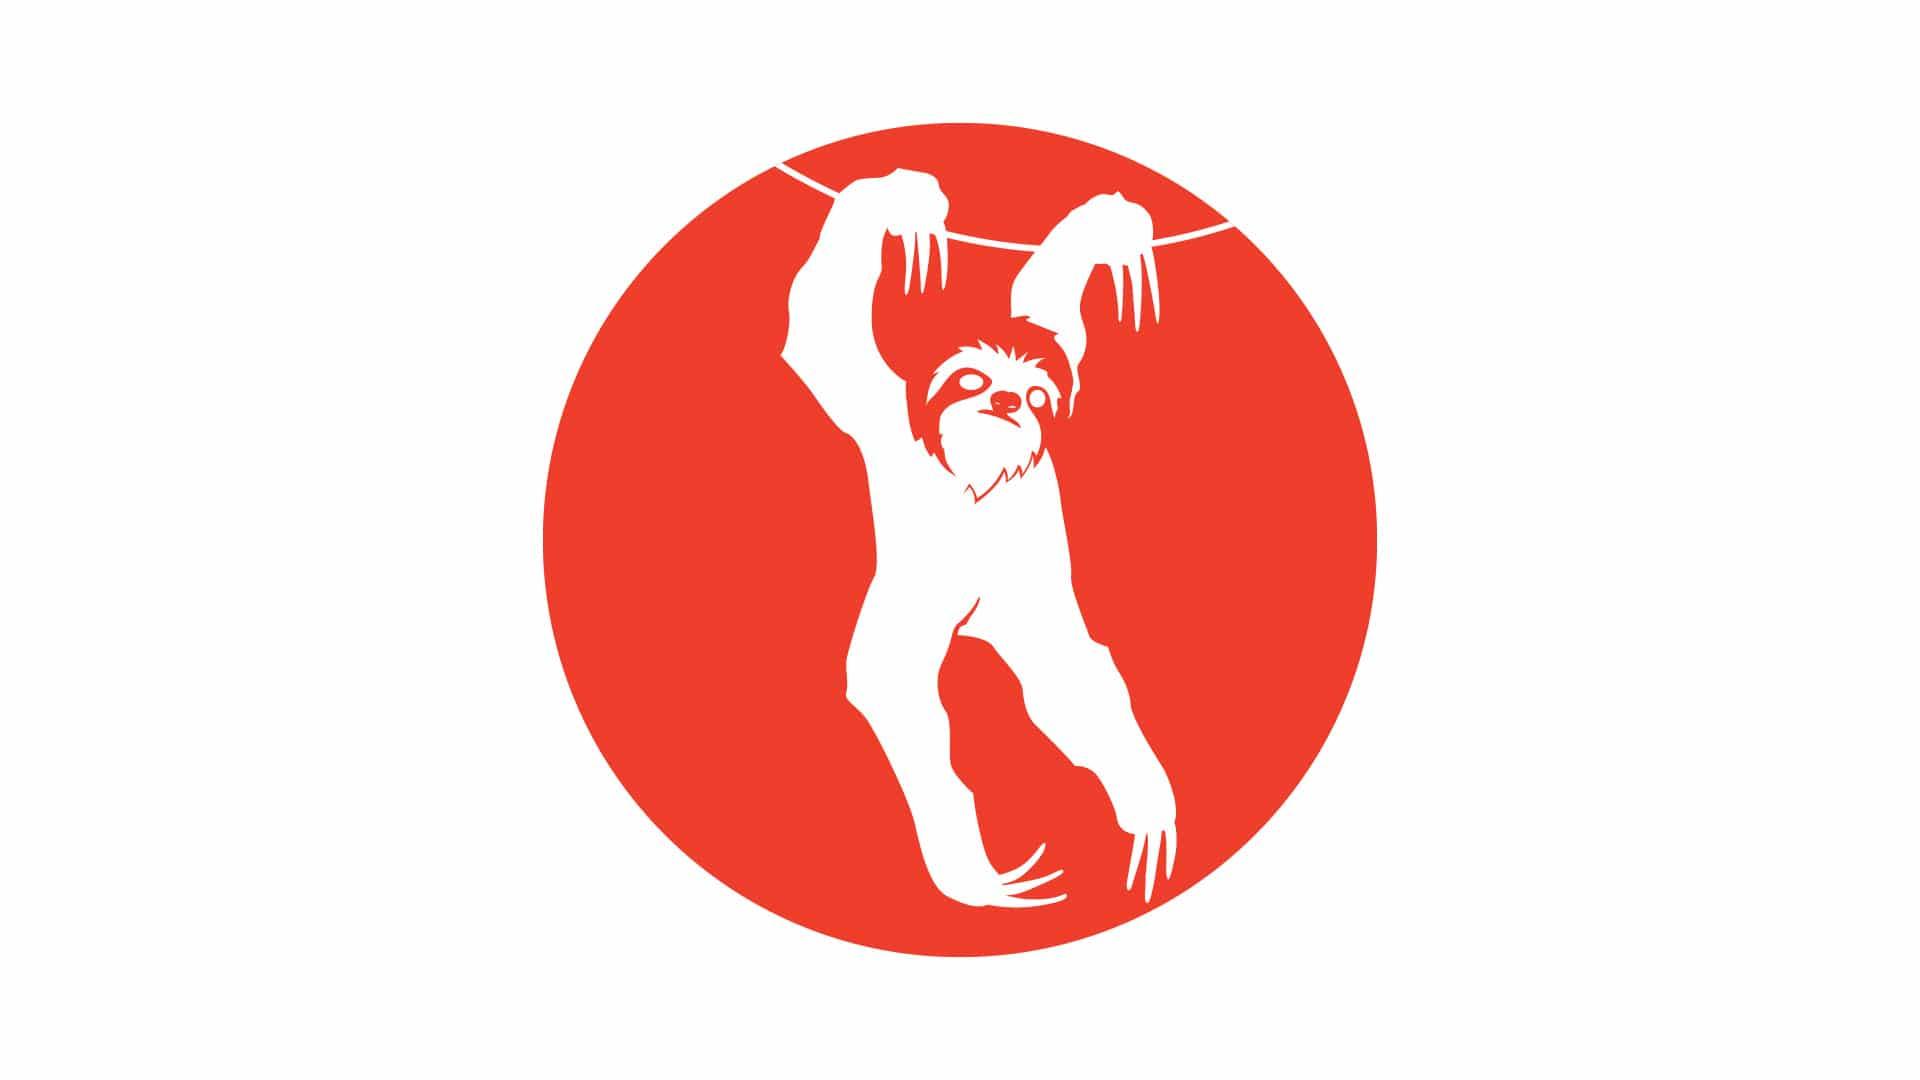 11 grafico milano monogram bradipo dischi